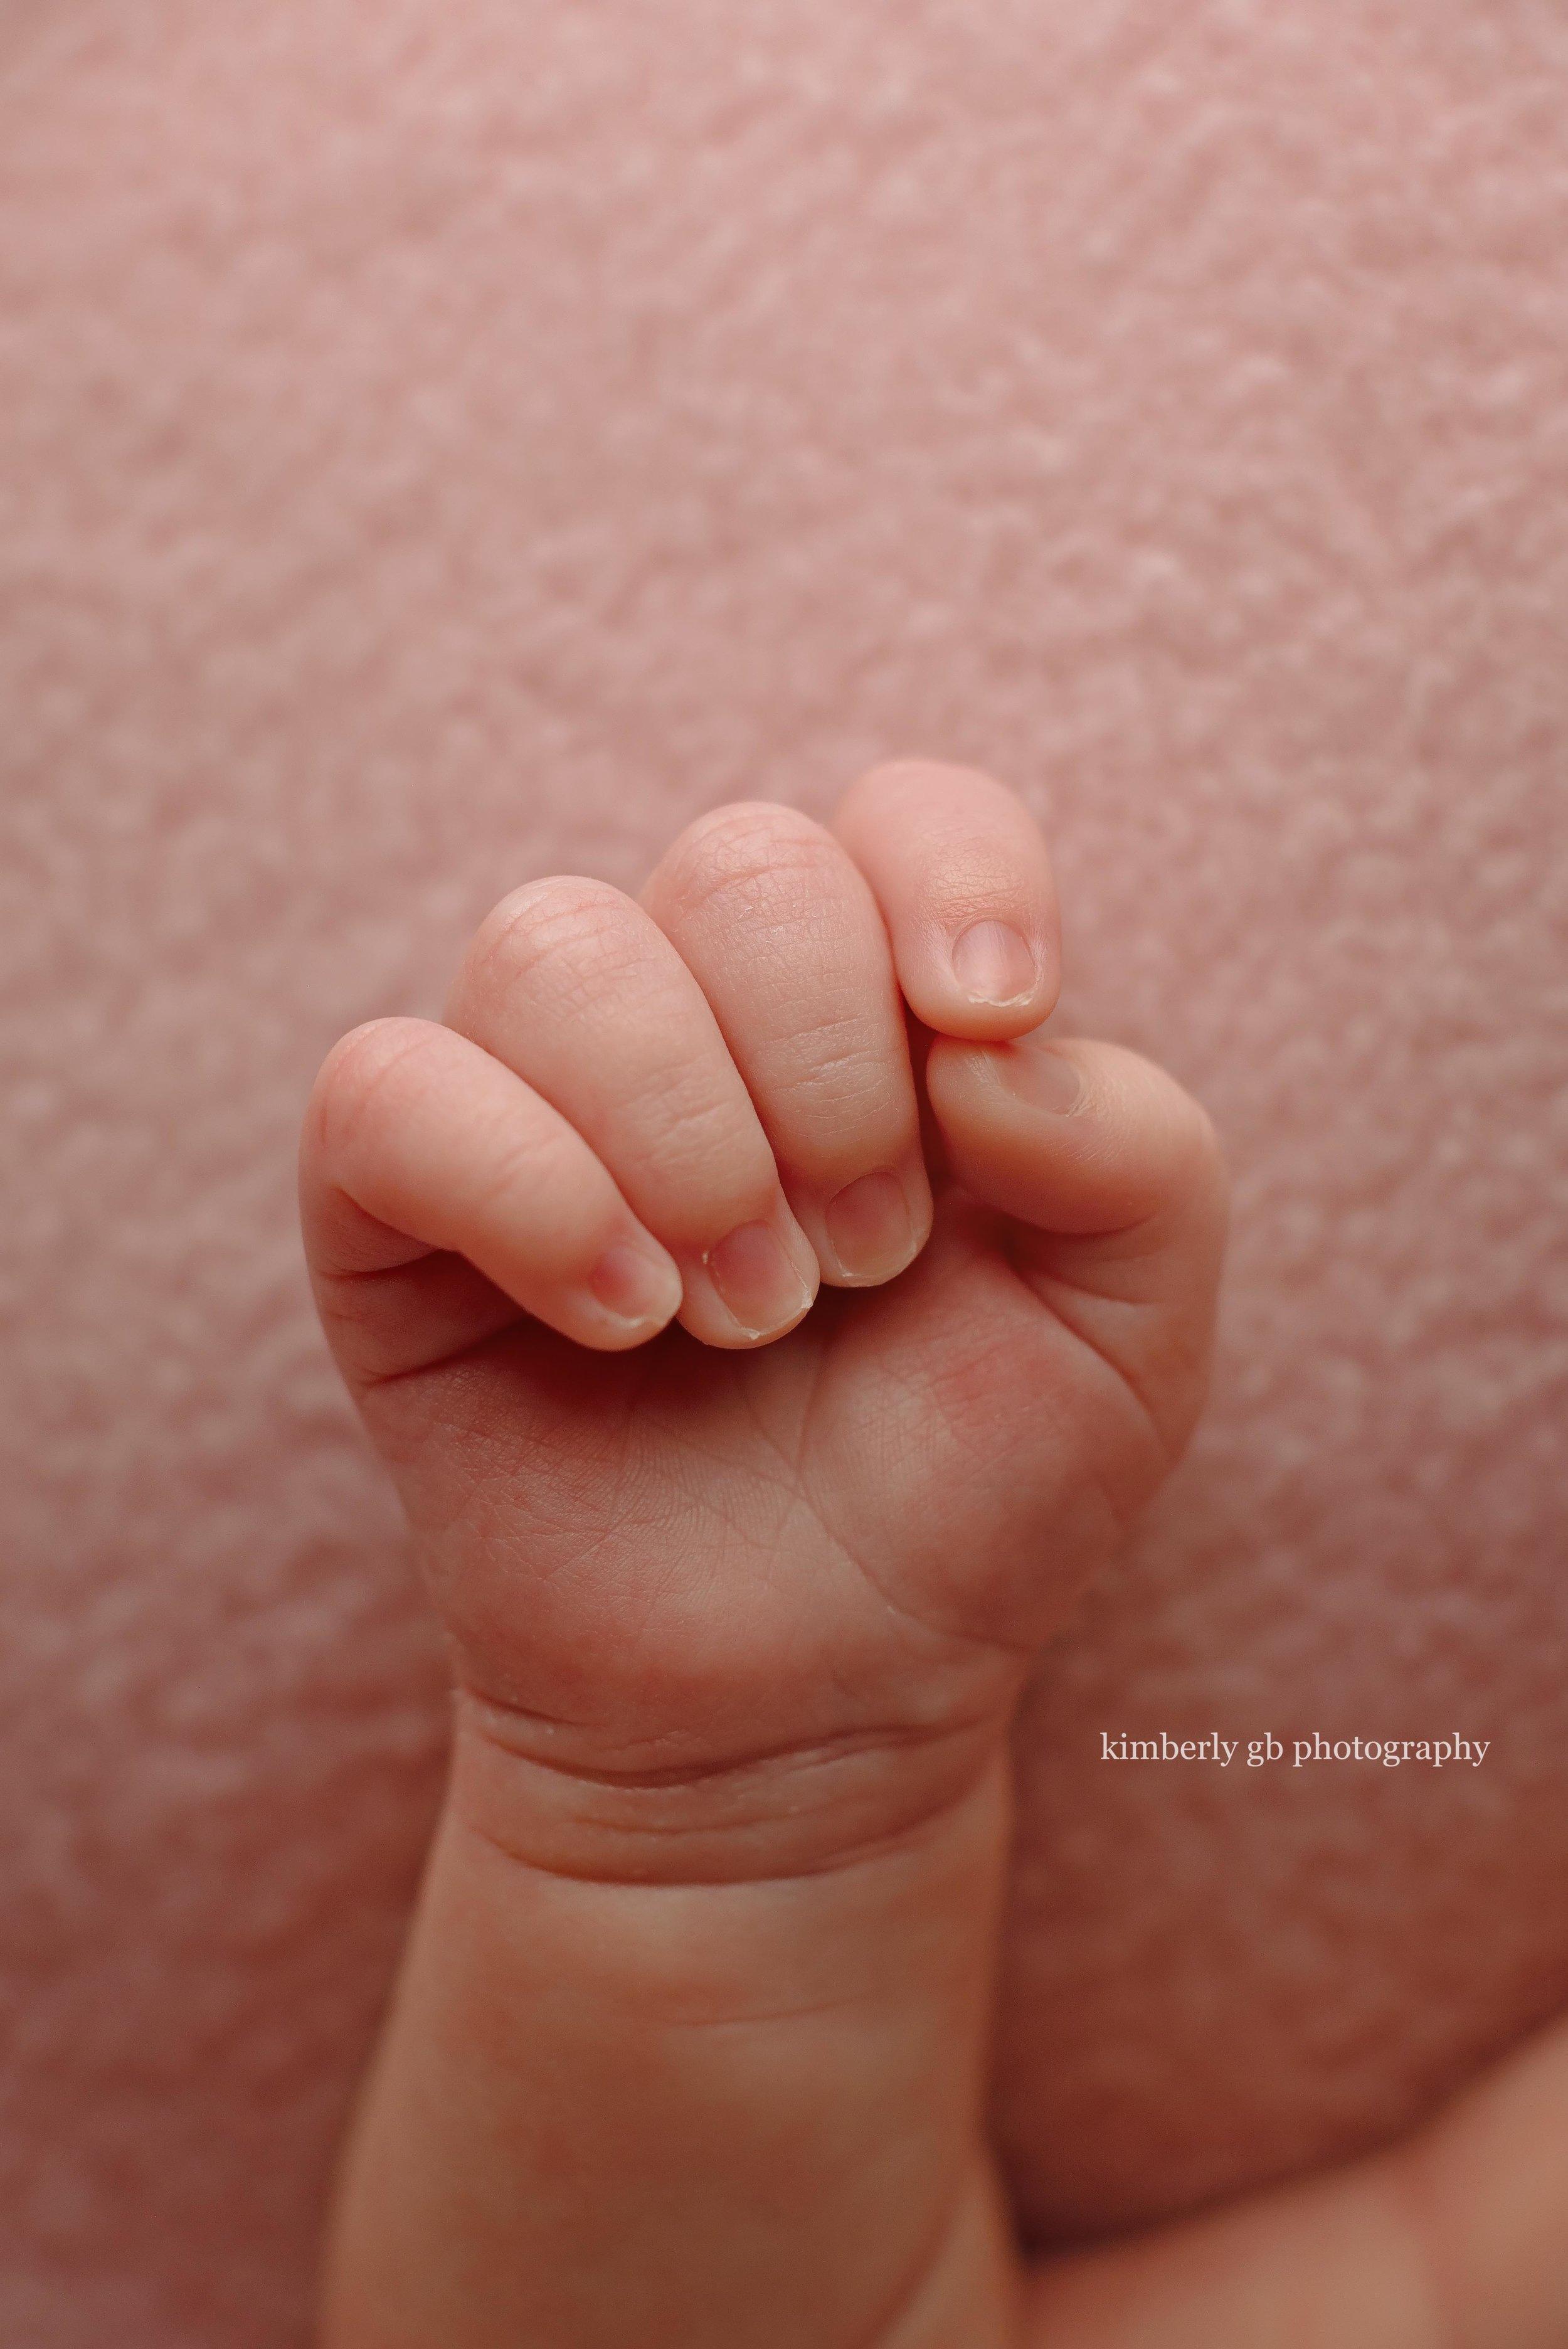 fotografia-de-recien-nacidos-bebes-newborn-en-puerto-rico-kimberly-gb-photography-fotografa-291.jpg